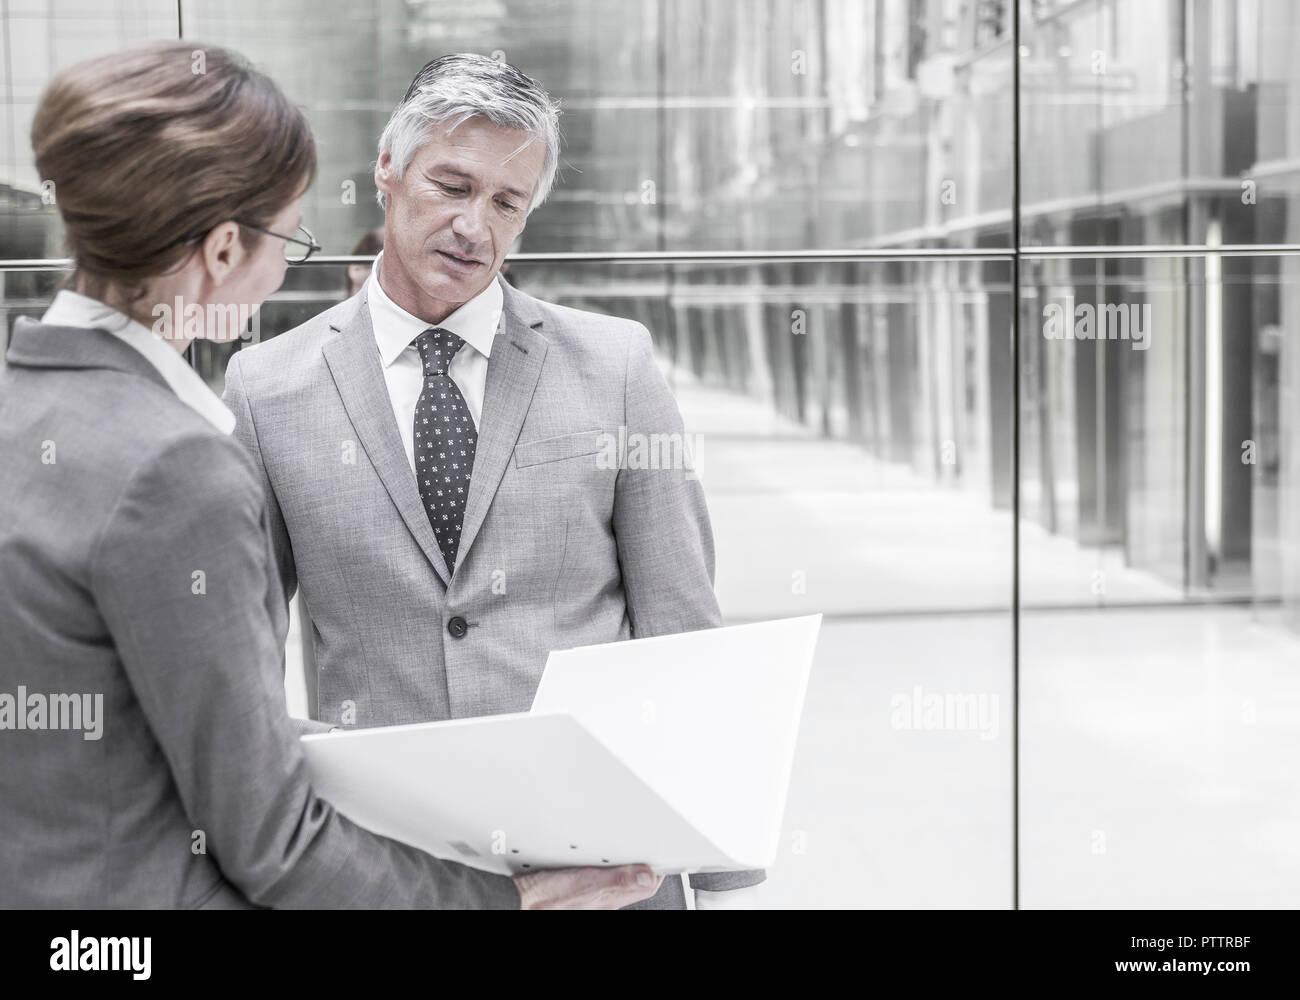 Frau und Mann dans geschaeftlicher Unterhaltung (modèle récent) Banque D'Images